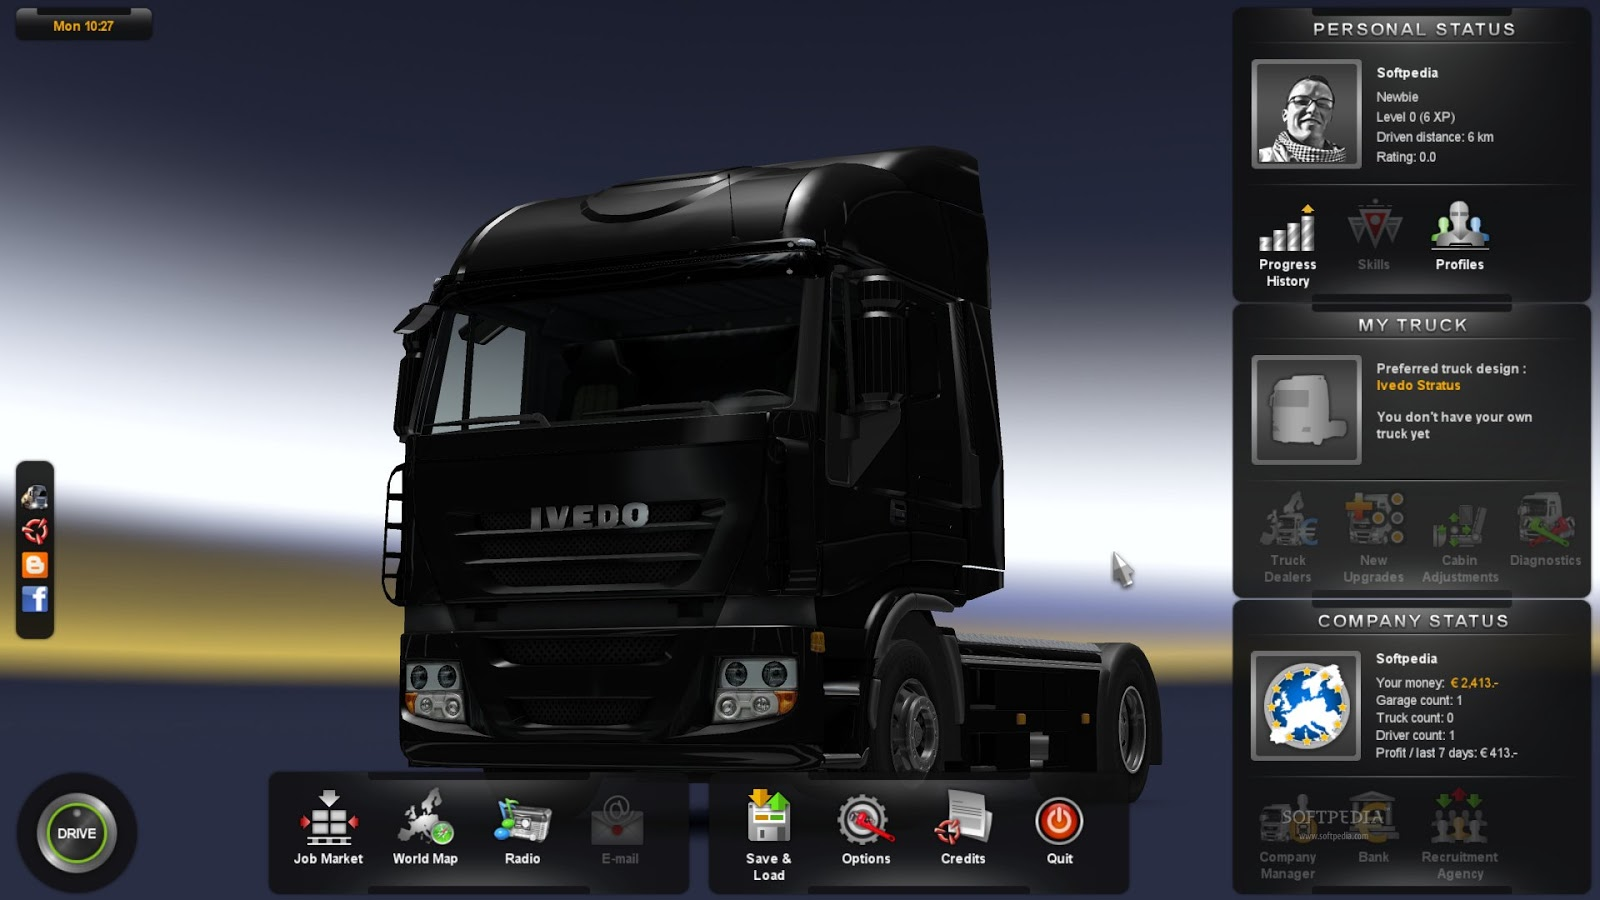 euro truck simulator 2 patch 1.9 22 crack download